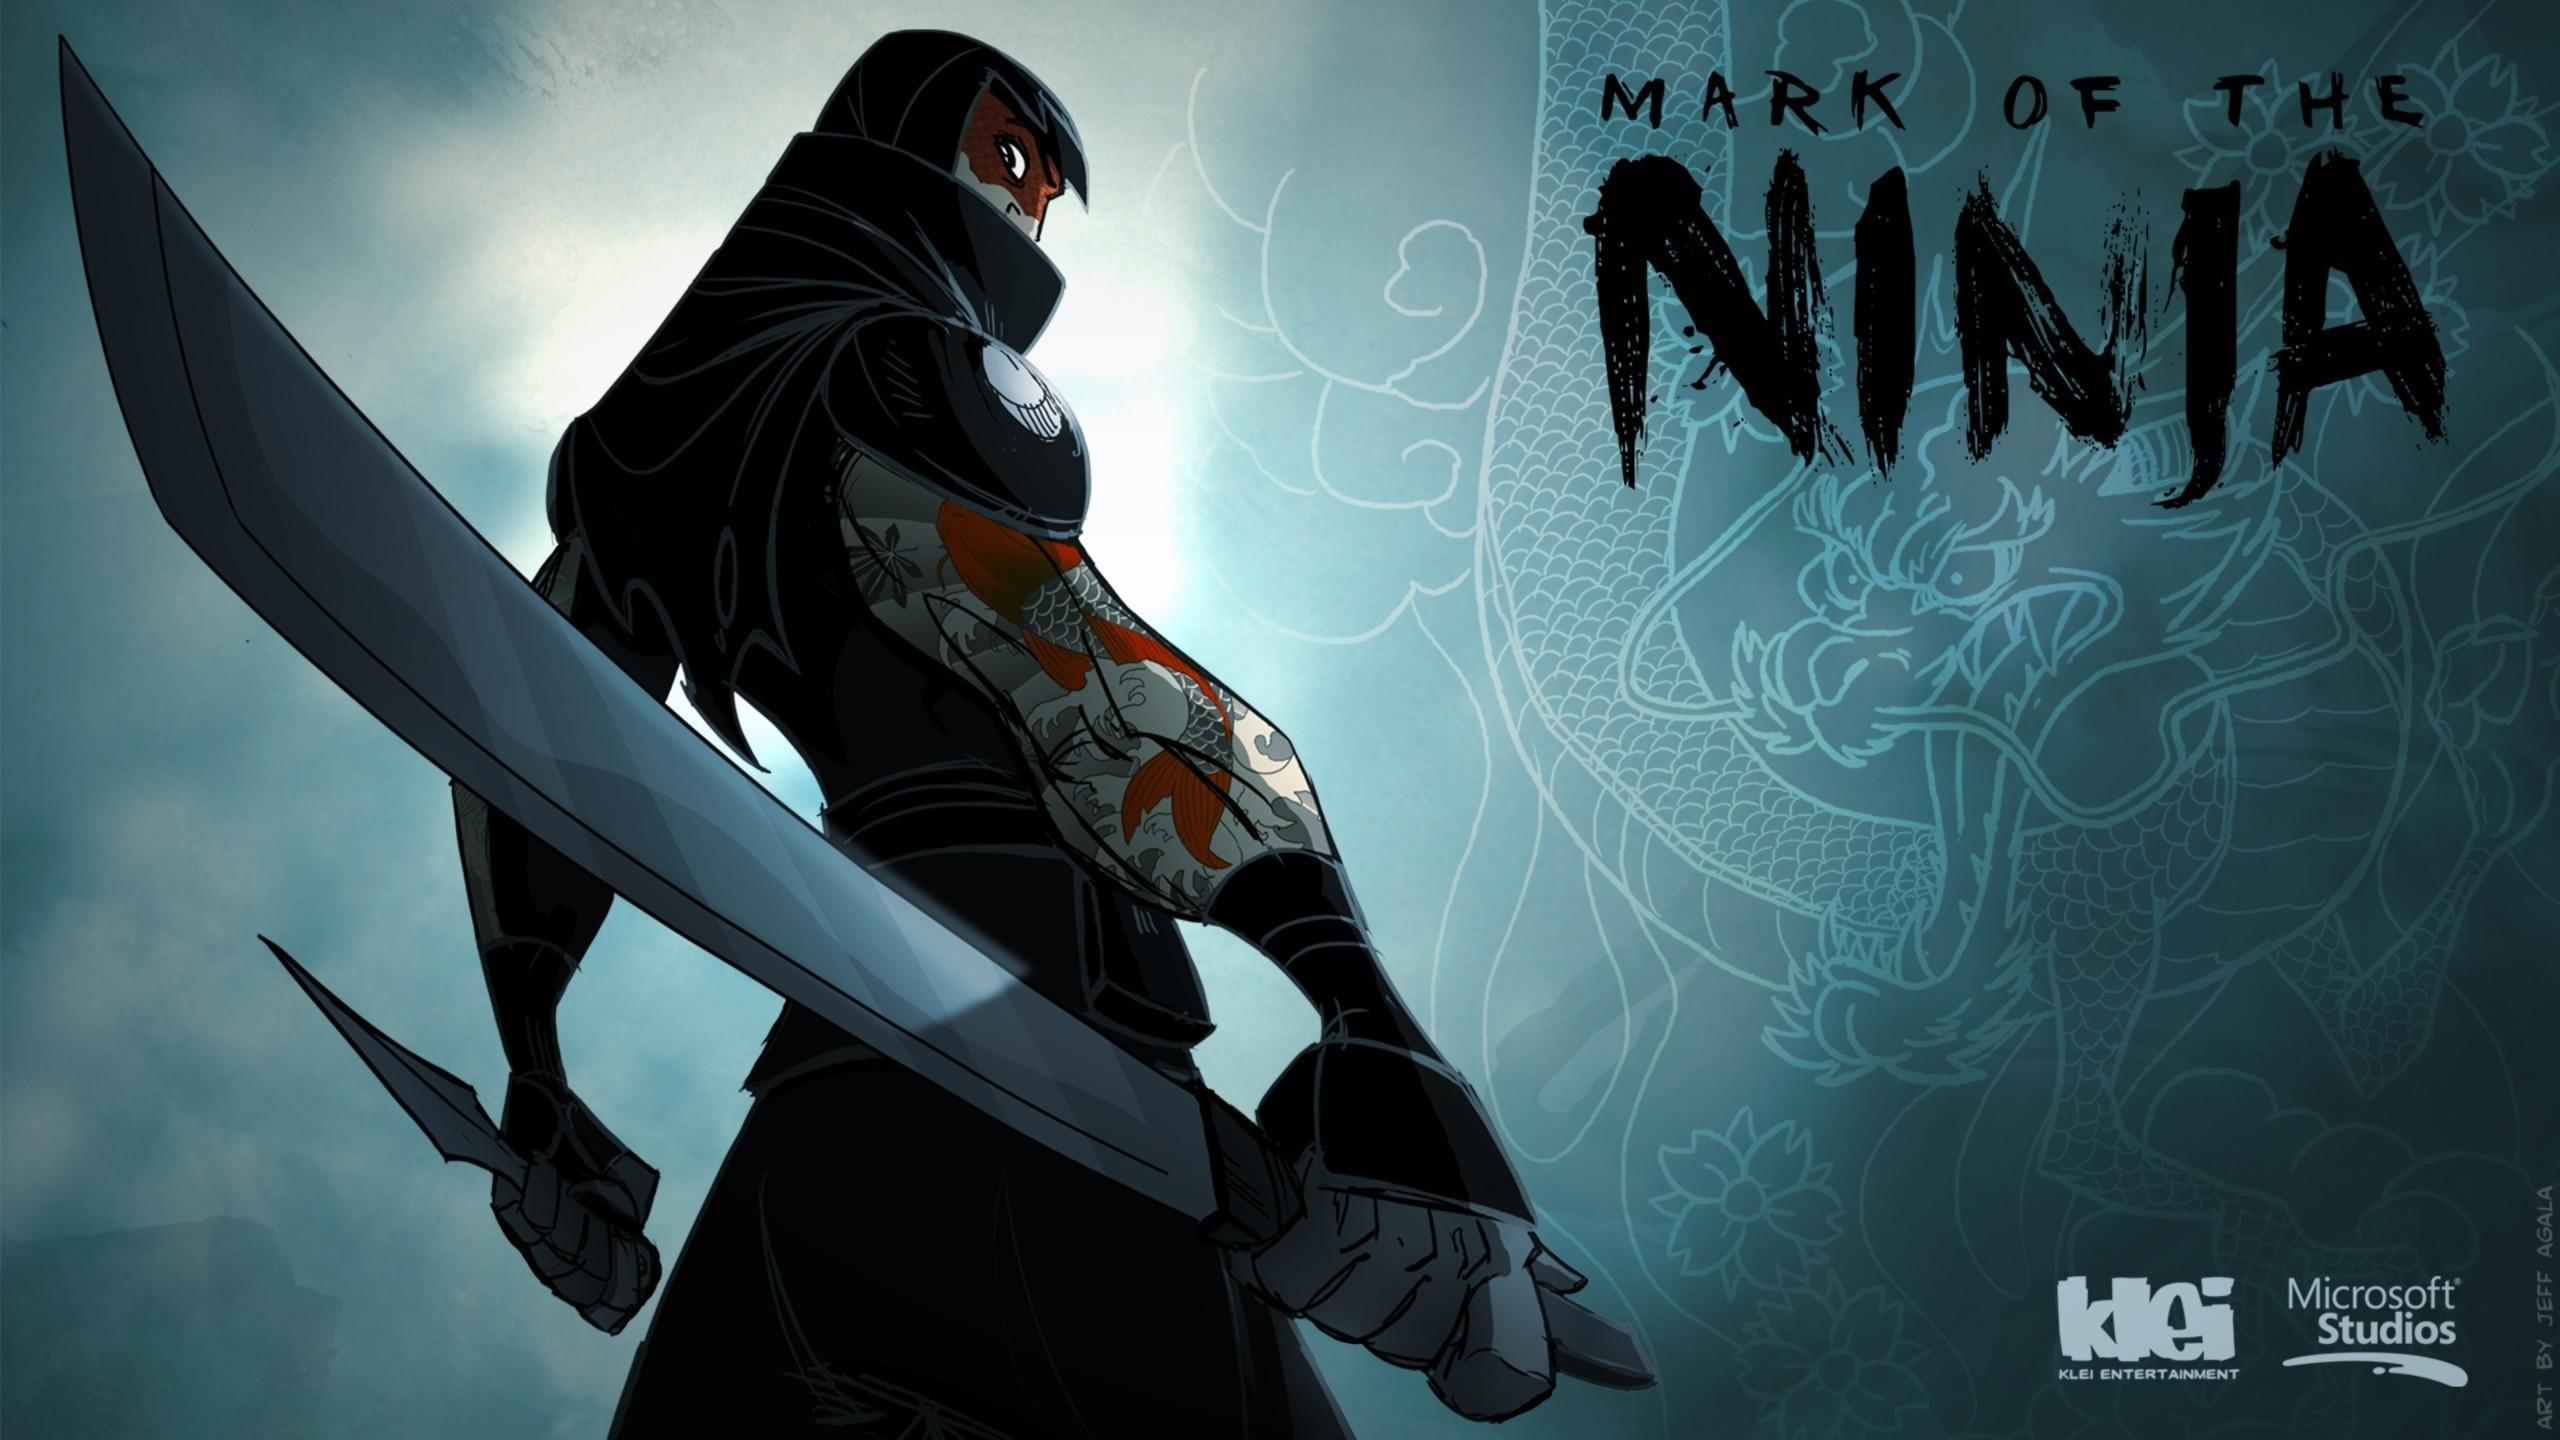 Res: 2560x1440, 1920x1080 wallpaper phantom assassin dota 2 art female game hd picture image